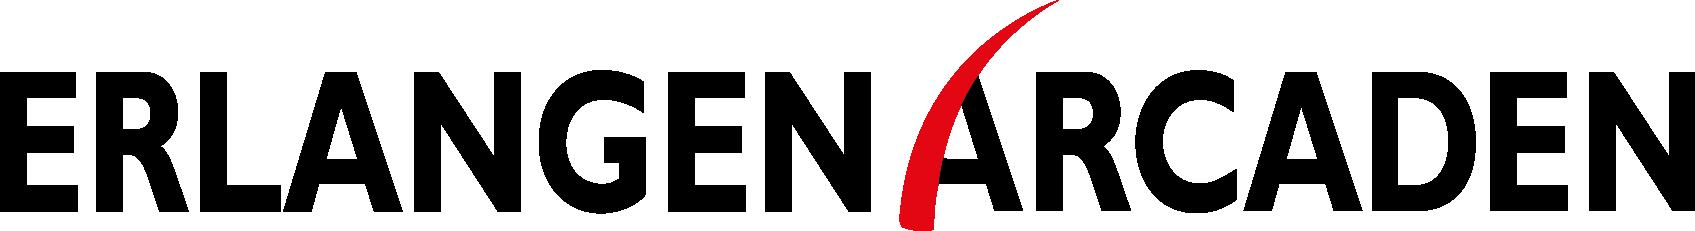 Erlangen Arcaden Logo